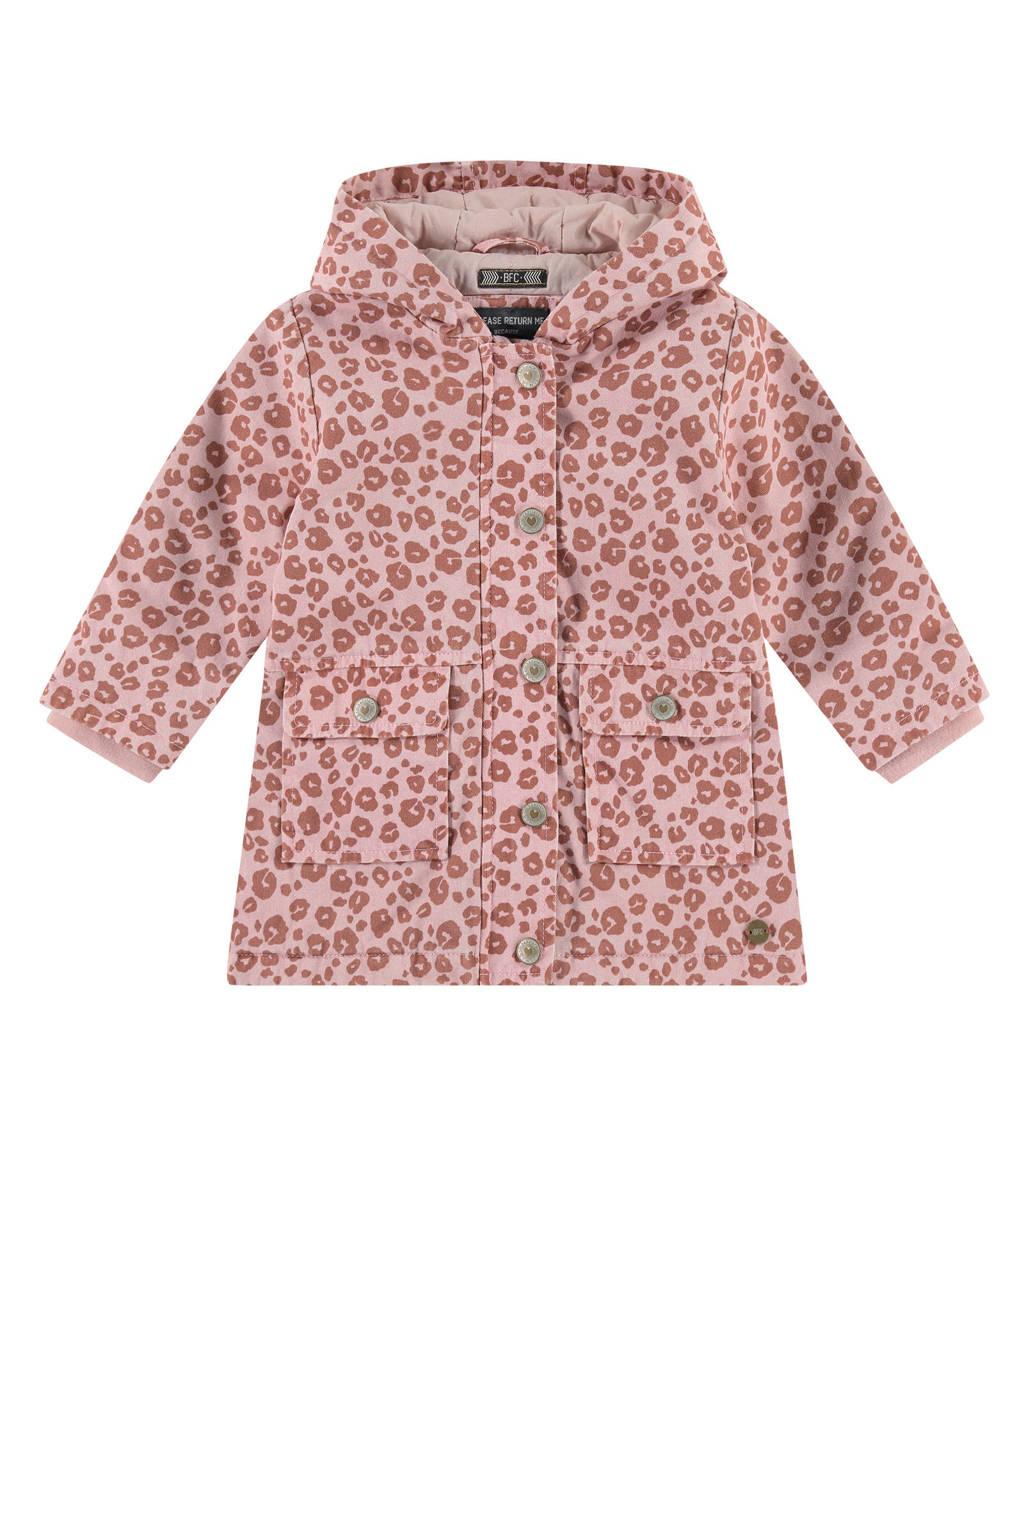 Babyface  zomerjas met all over print roze/oudroze, Roze/oudroze